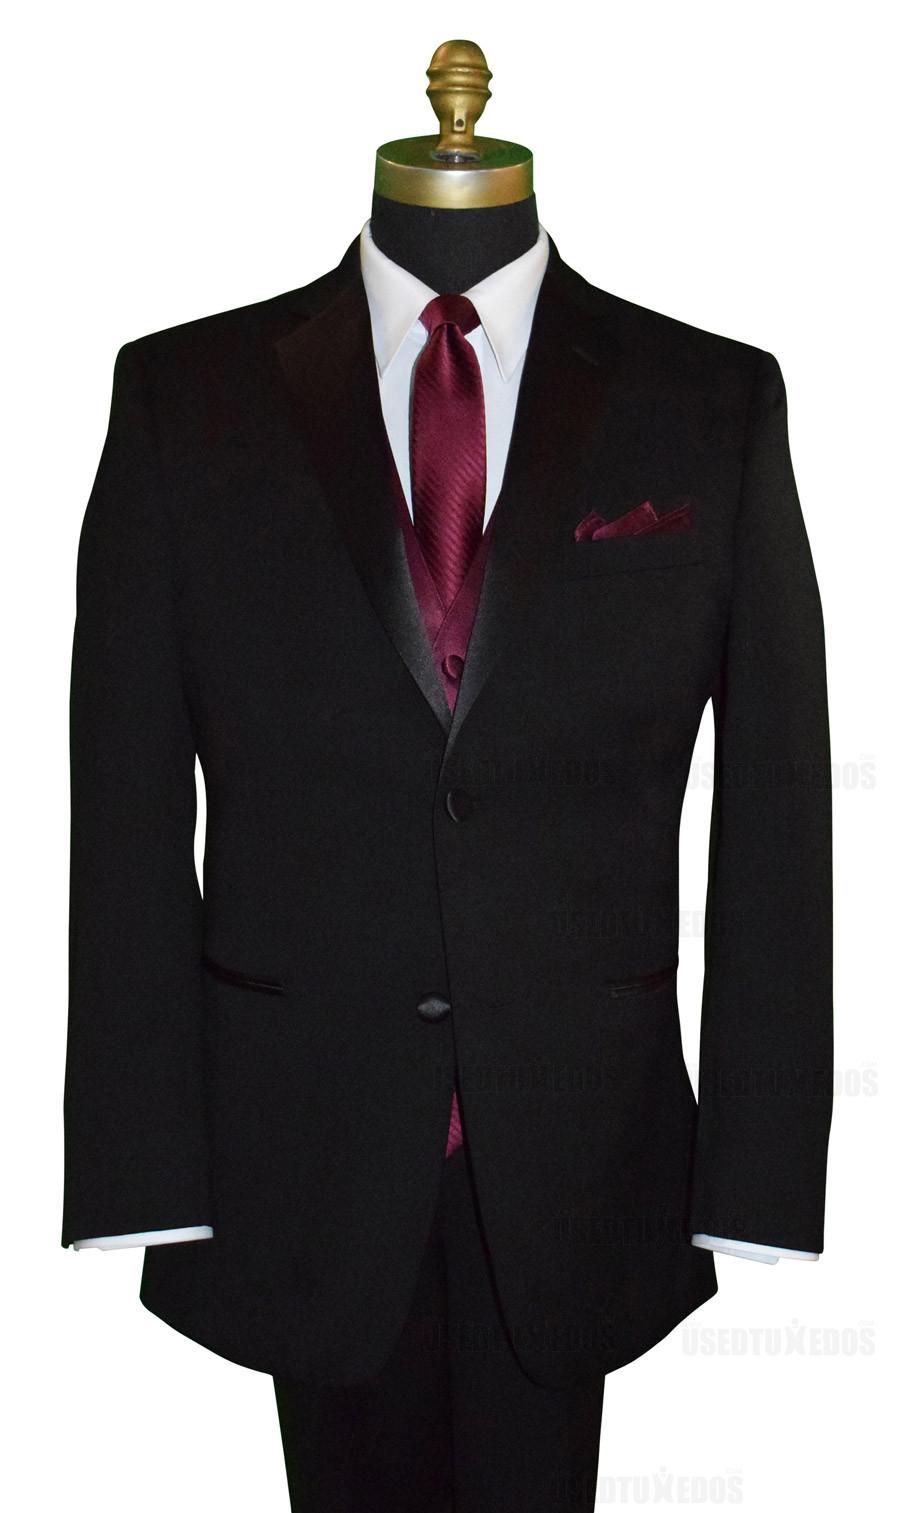 wine striped long dress tie, wine vest and wine pocket handkerchief by San Miguel Formals